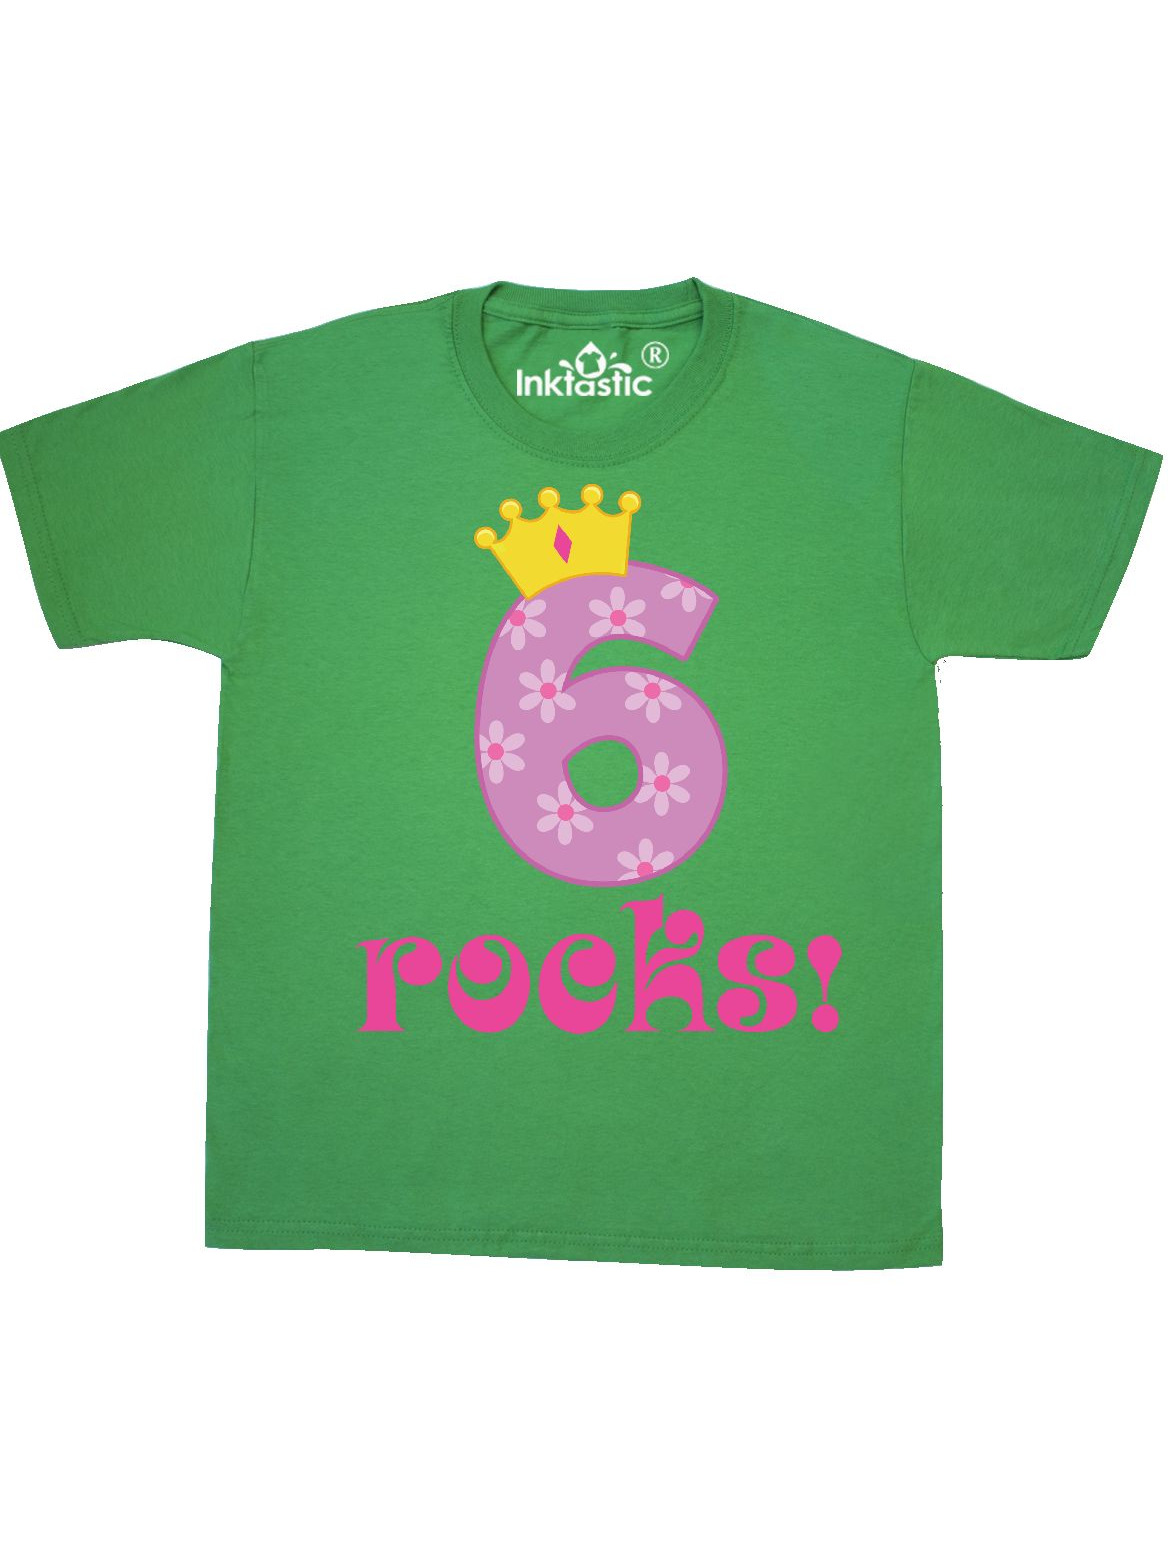 6th Birthday Rocks Youth T-Shirt